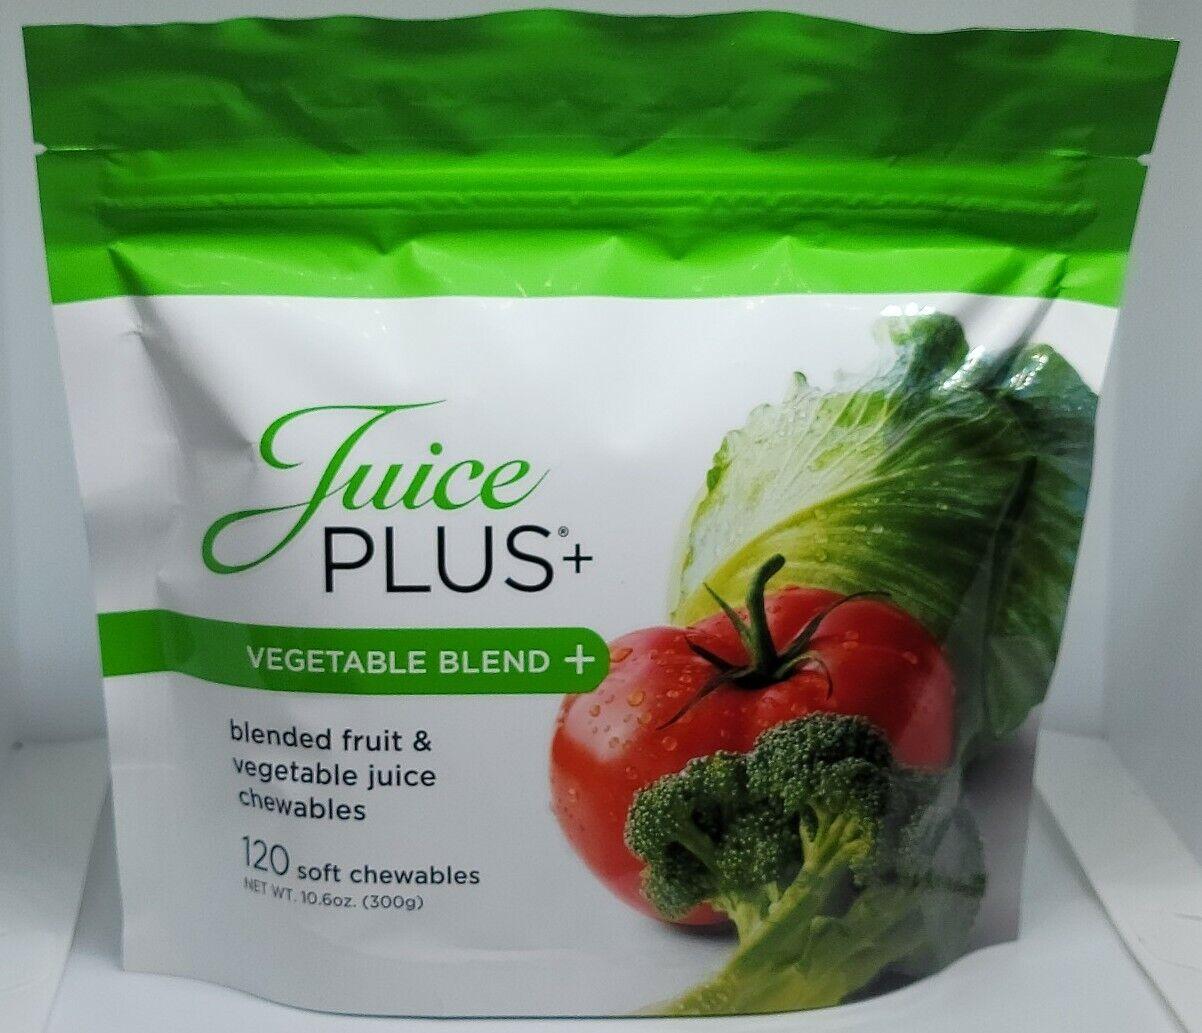 Juice Plus 120 Soft Chewables Gummies Vegetable Blend New Best By 04/2021